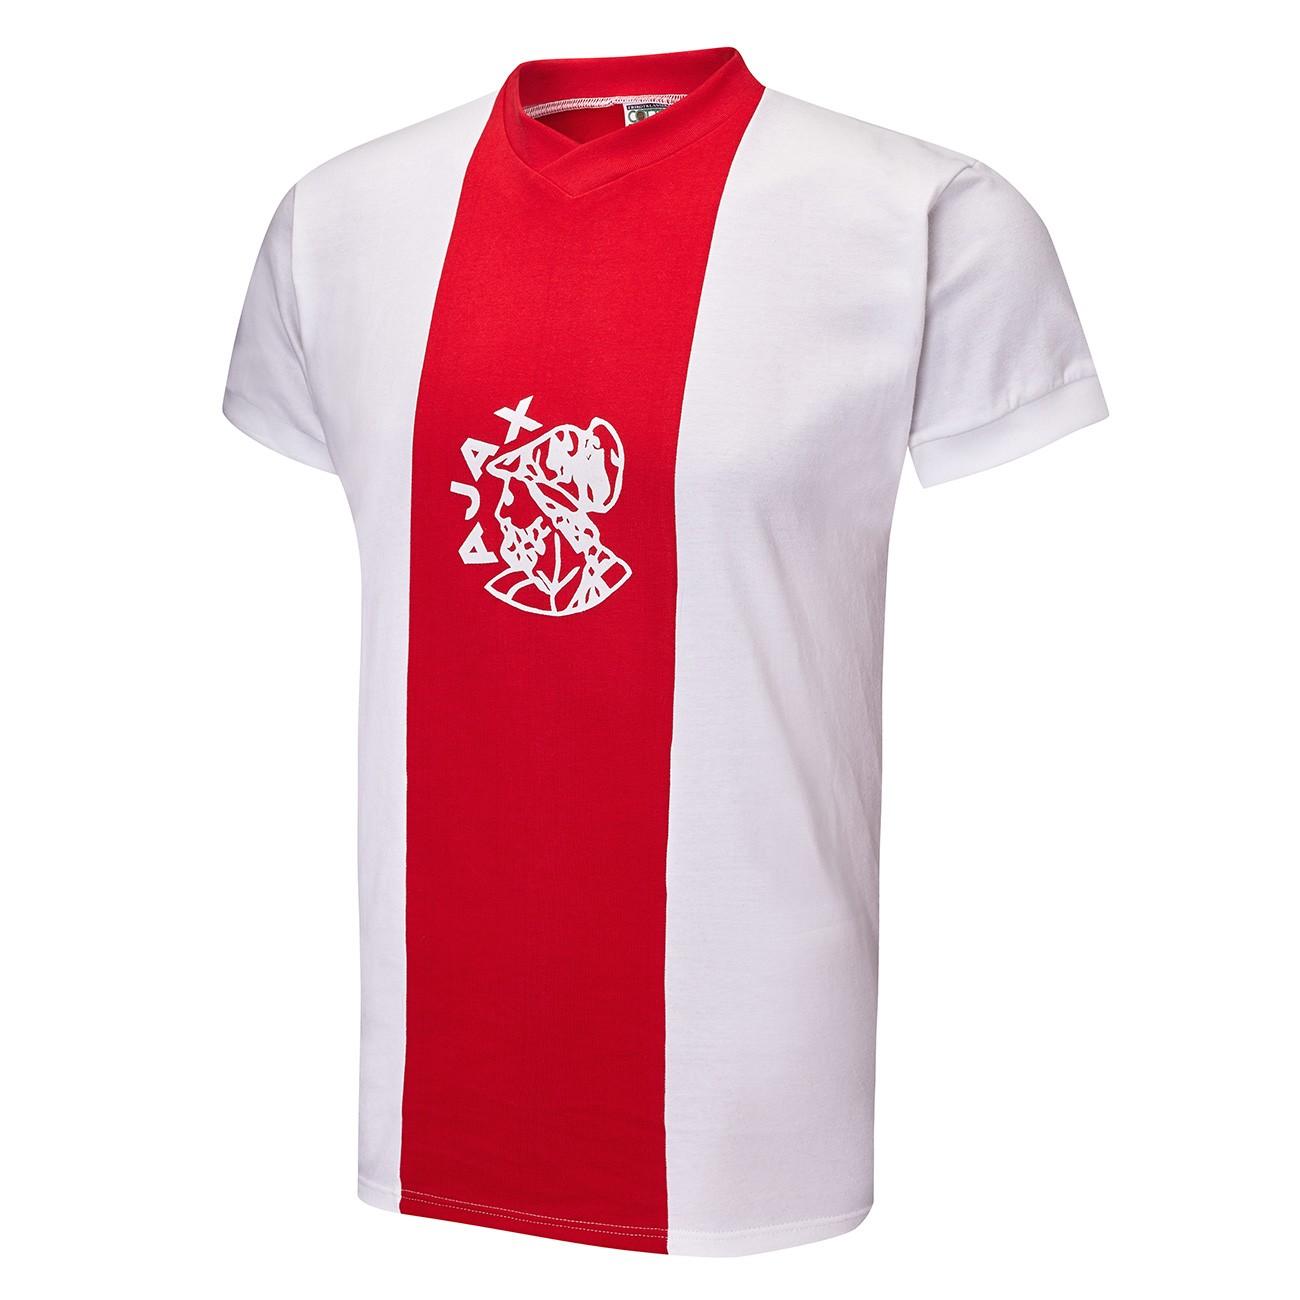 http://www.retrofootball.es/ropa-de-futbol/camiseta-ajax-1972-73.html